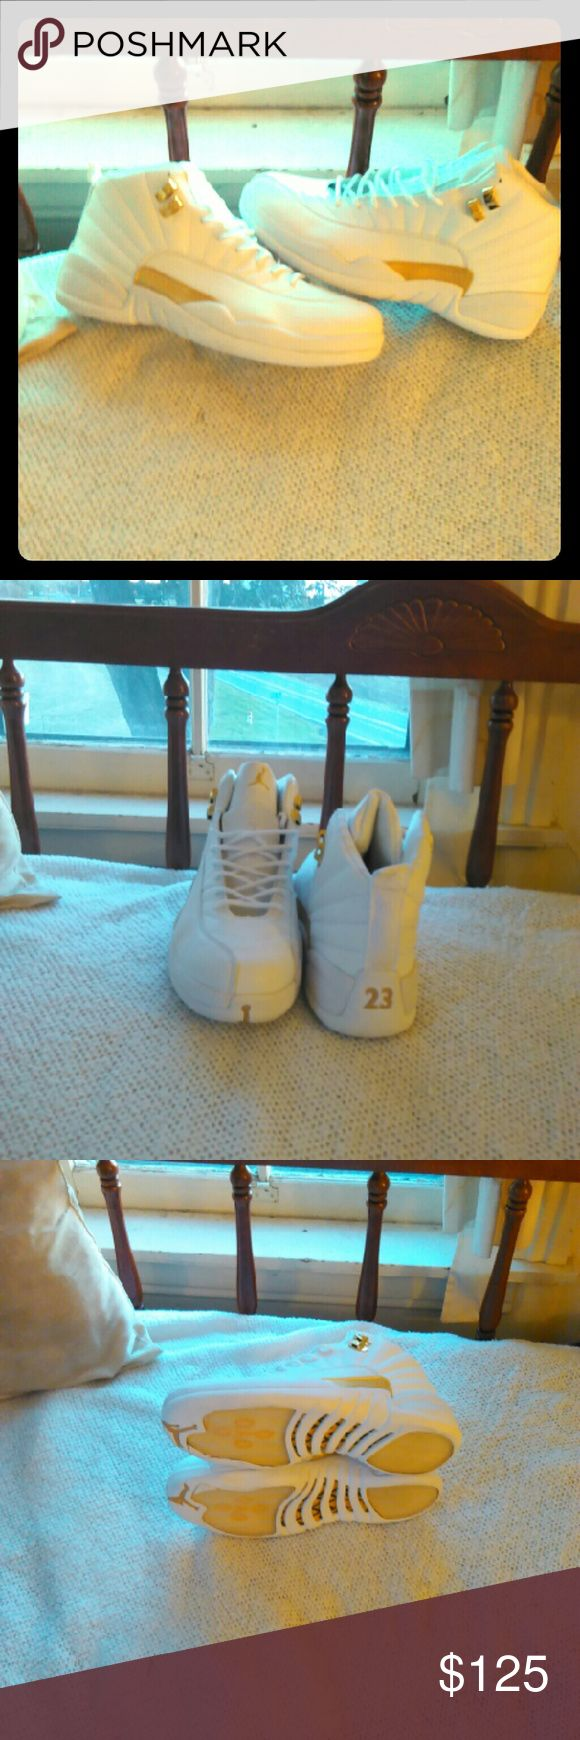 Jordan 12 ovo Size 10 Reps Jordan Shoes Athletic Shoes